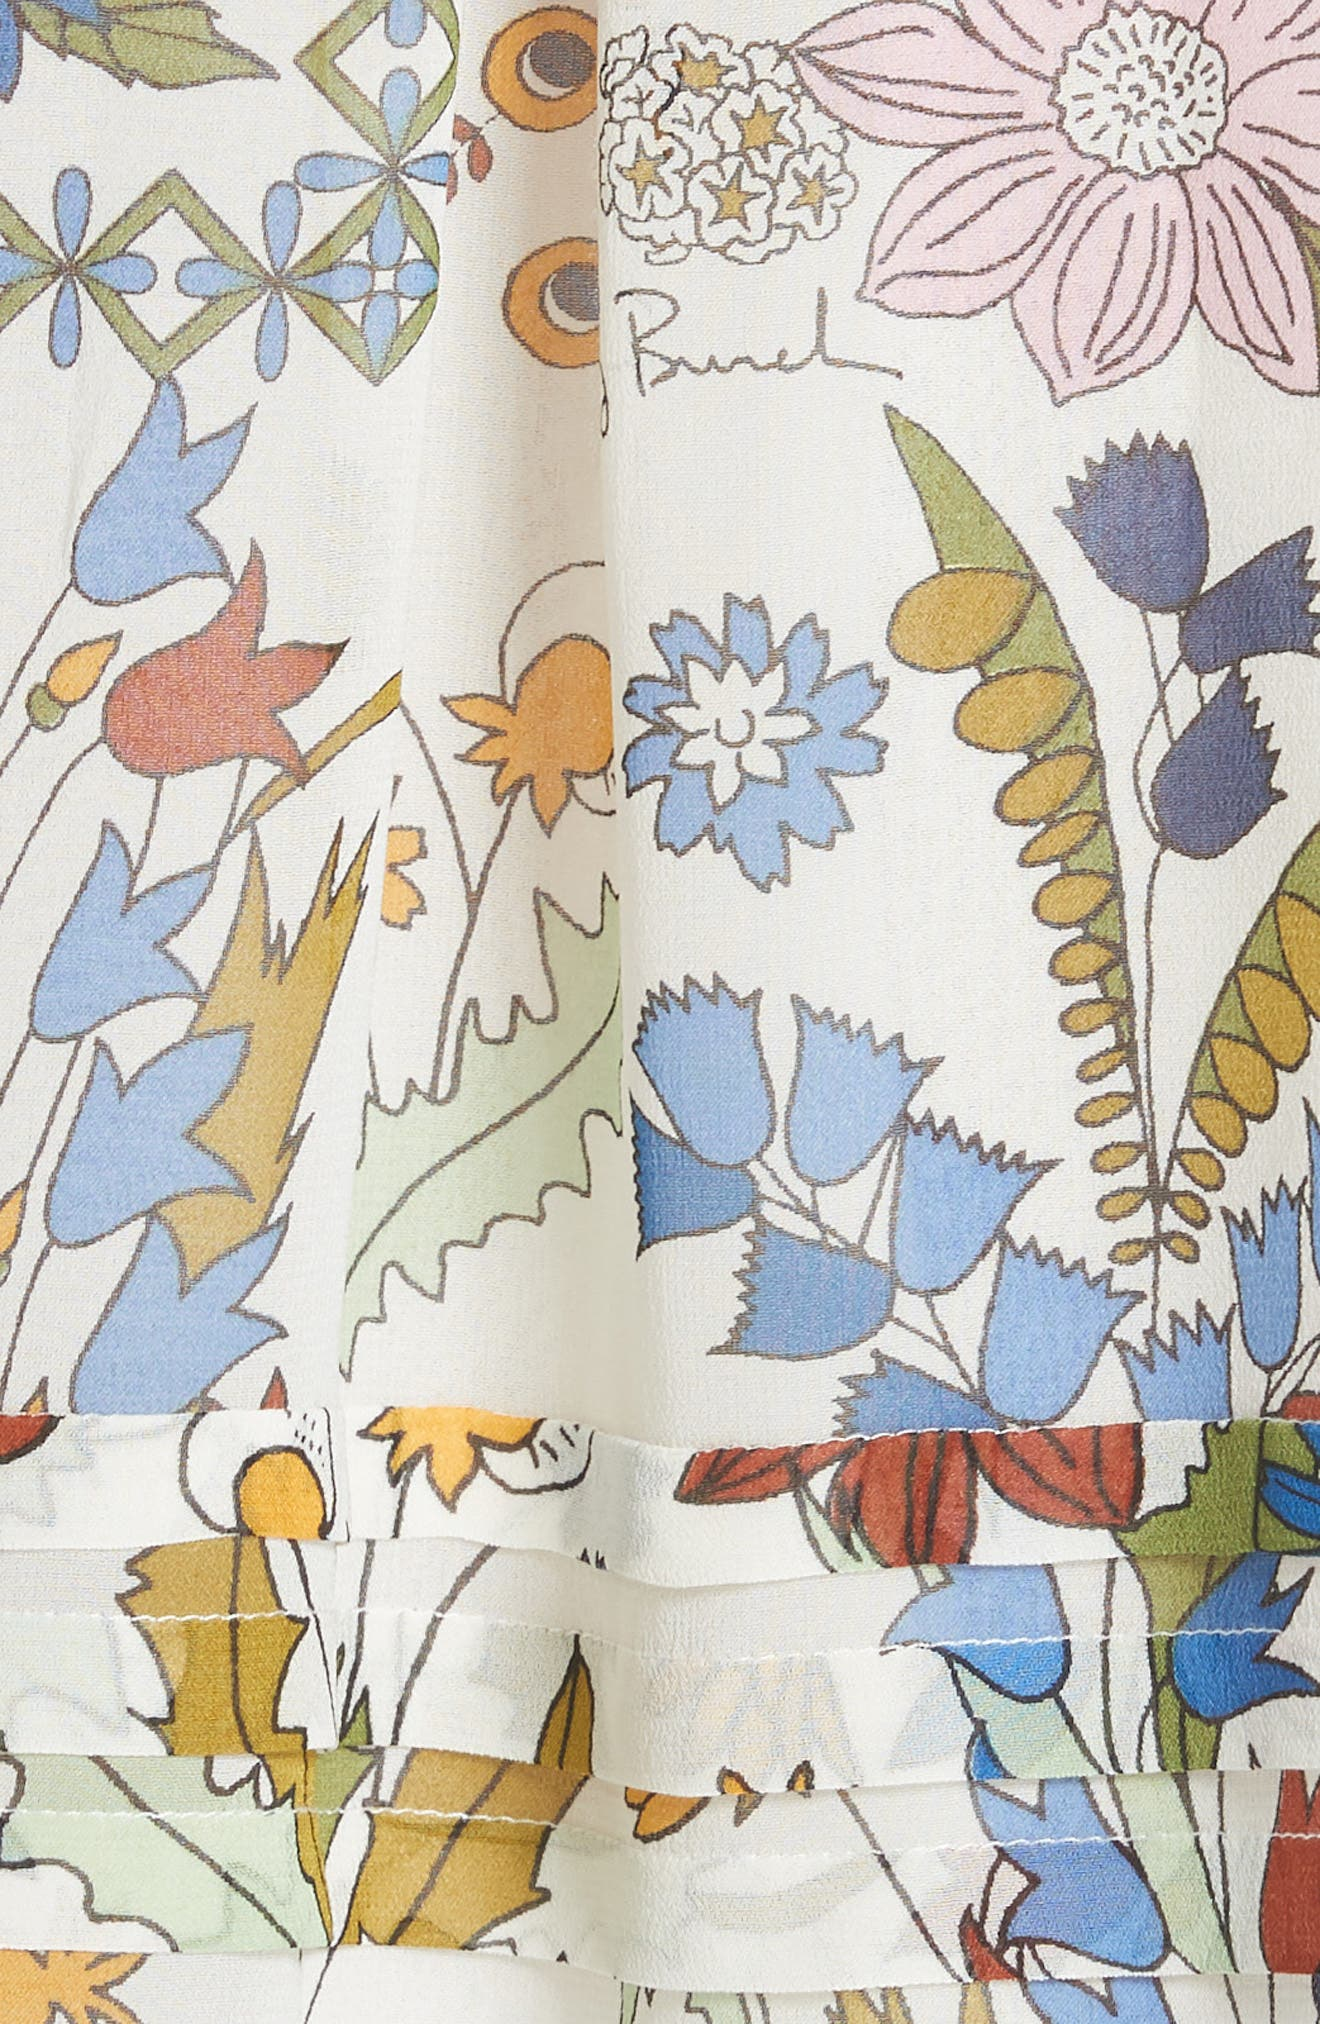 Waverly Floral Print Silk Midi Dress,                             Alternate thumbnail 3, color,                             Ivory Meadow Folly